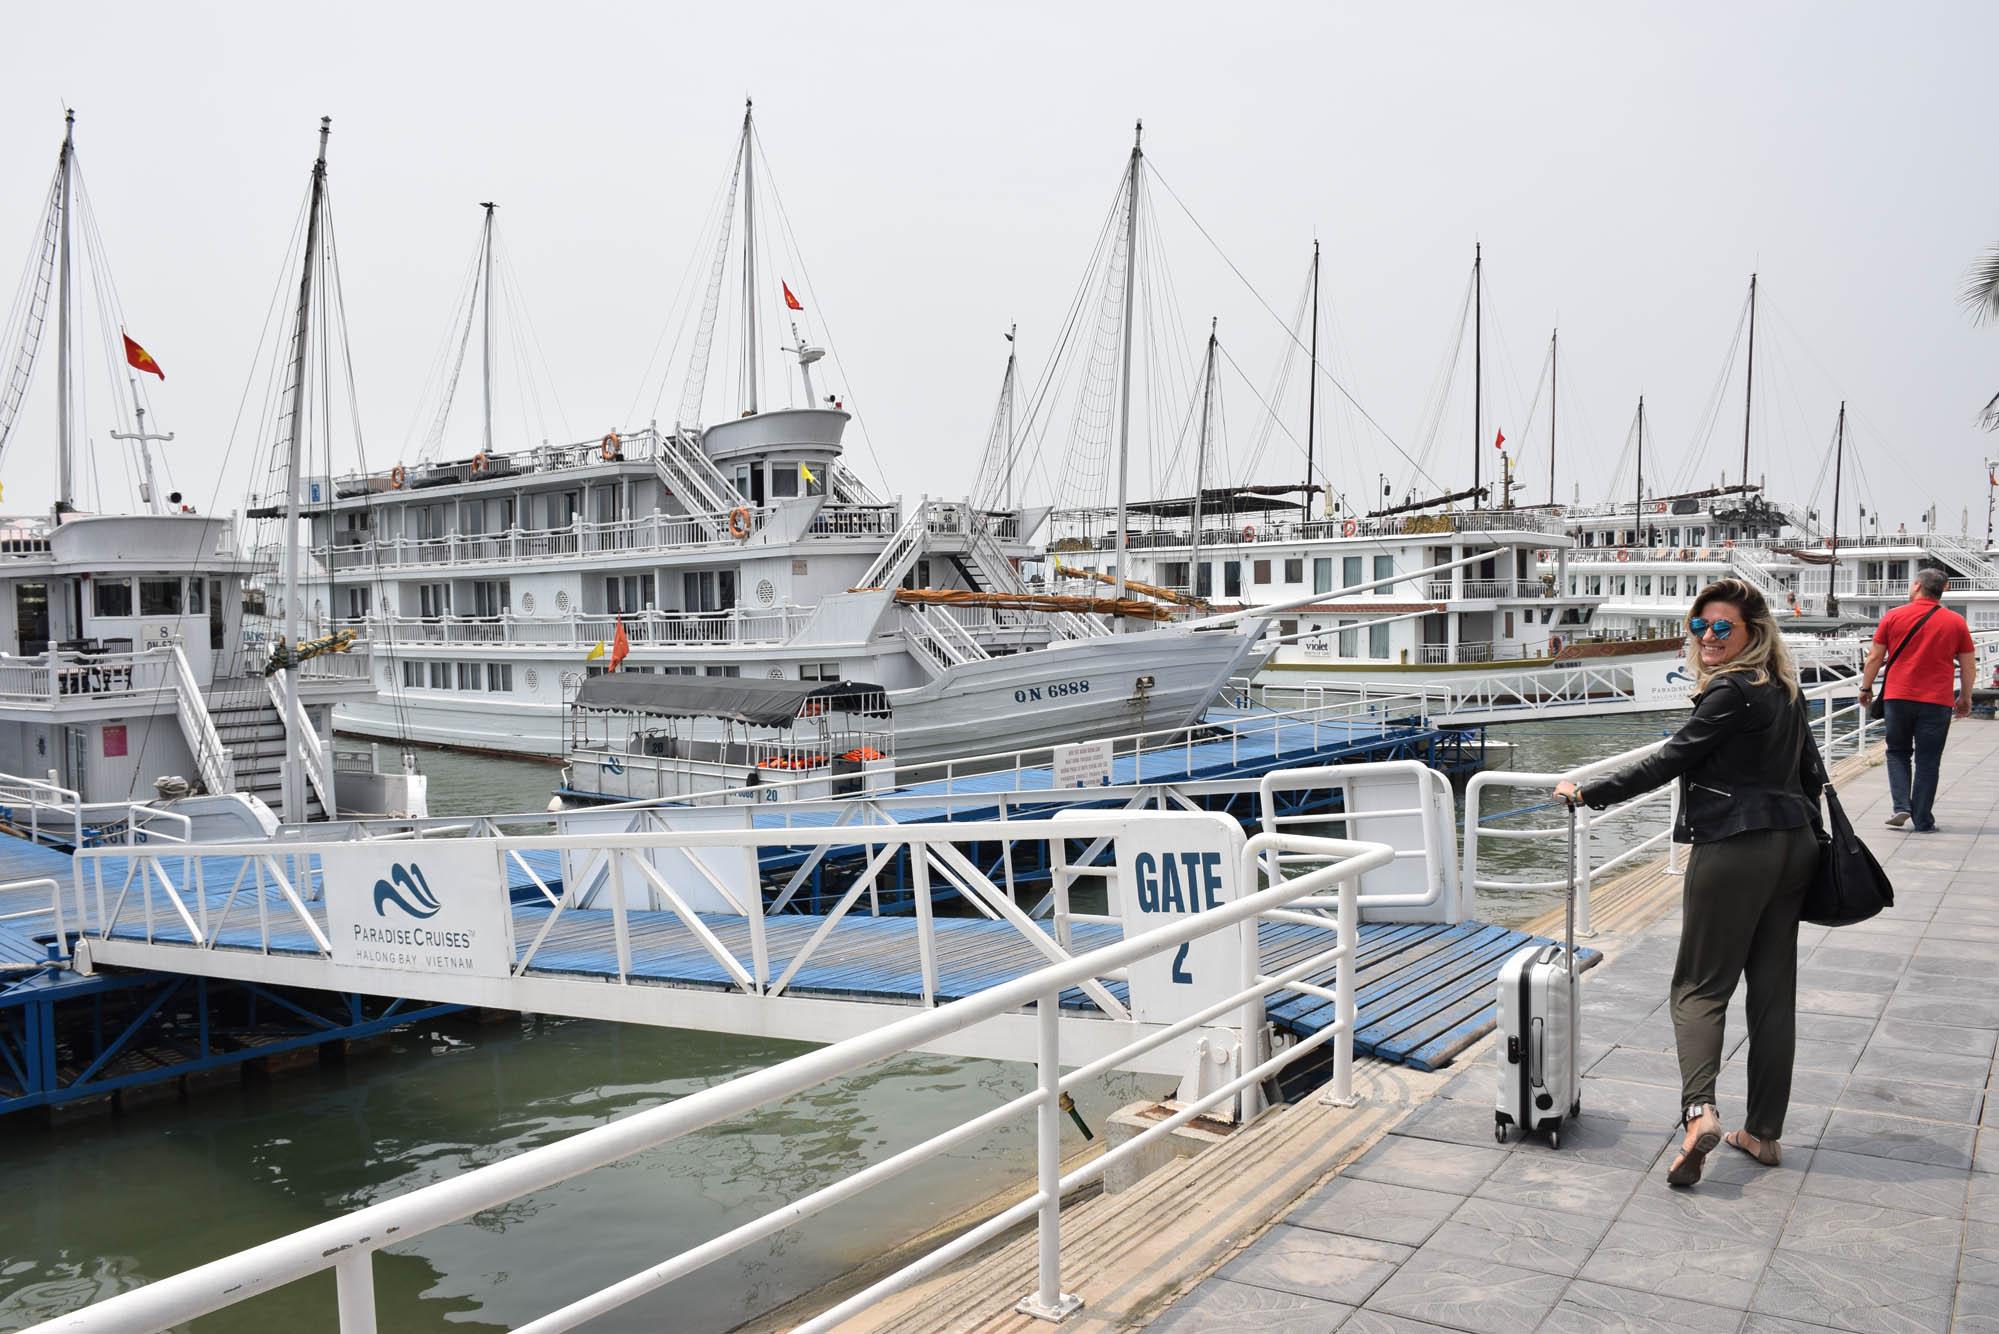 Píer da Paradise Cruises em Halong Bay, Vietnã